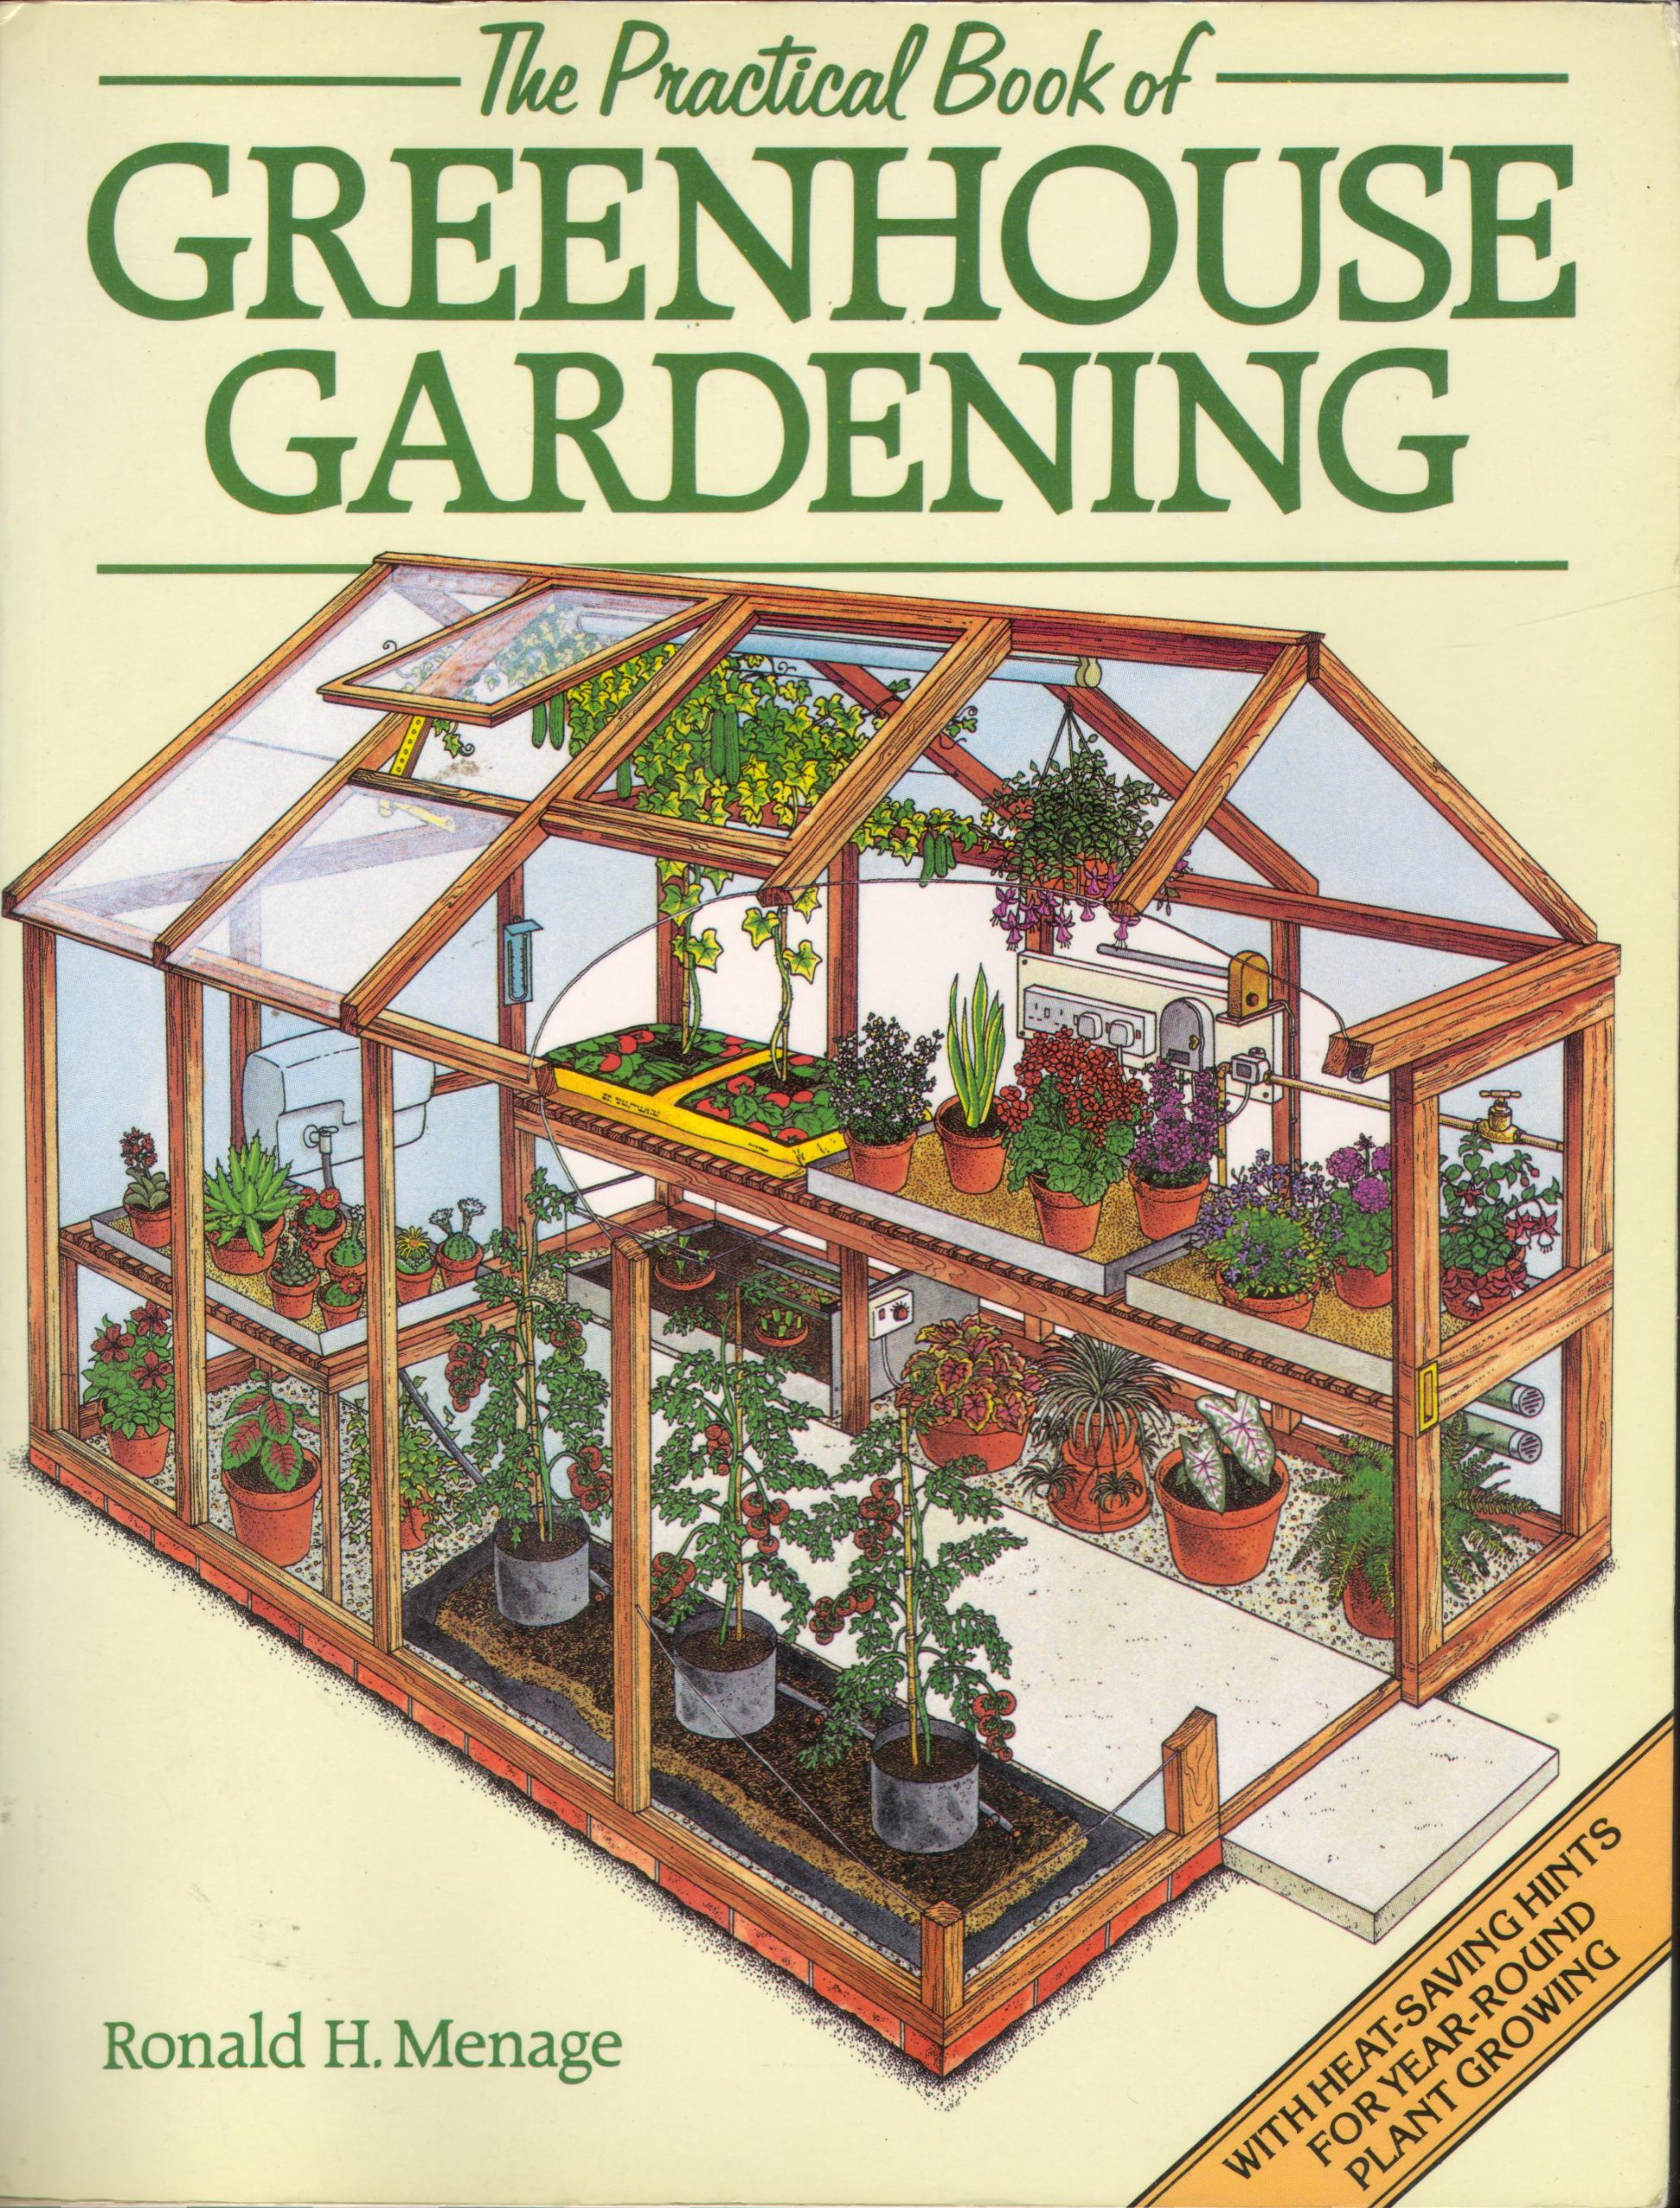 project set garden whistler greenhouse locations aware grow ready slide gardening